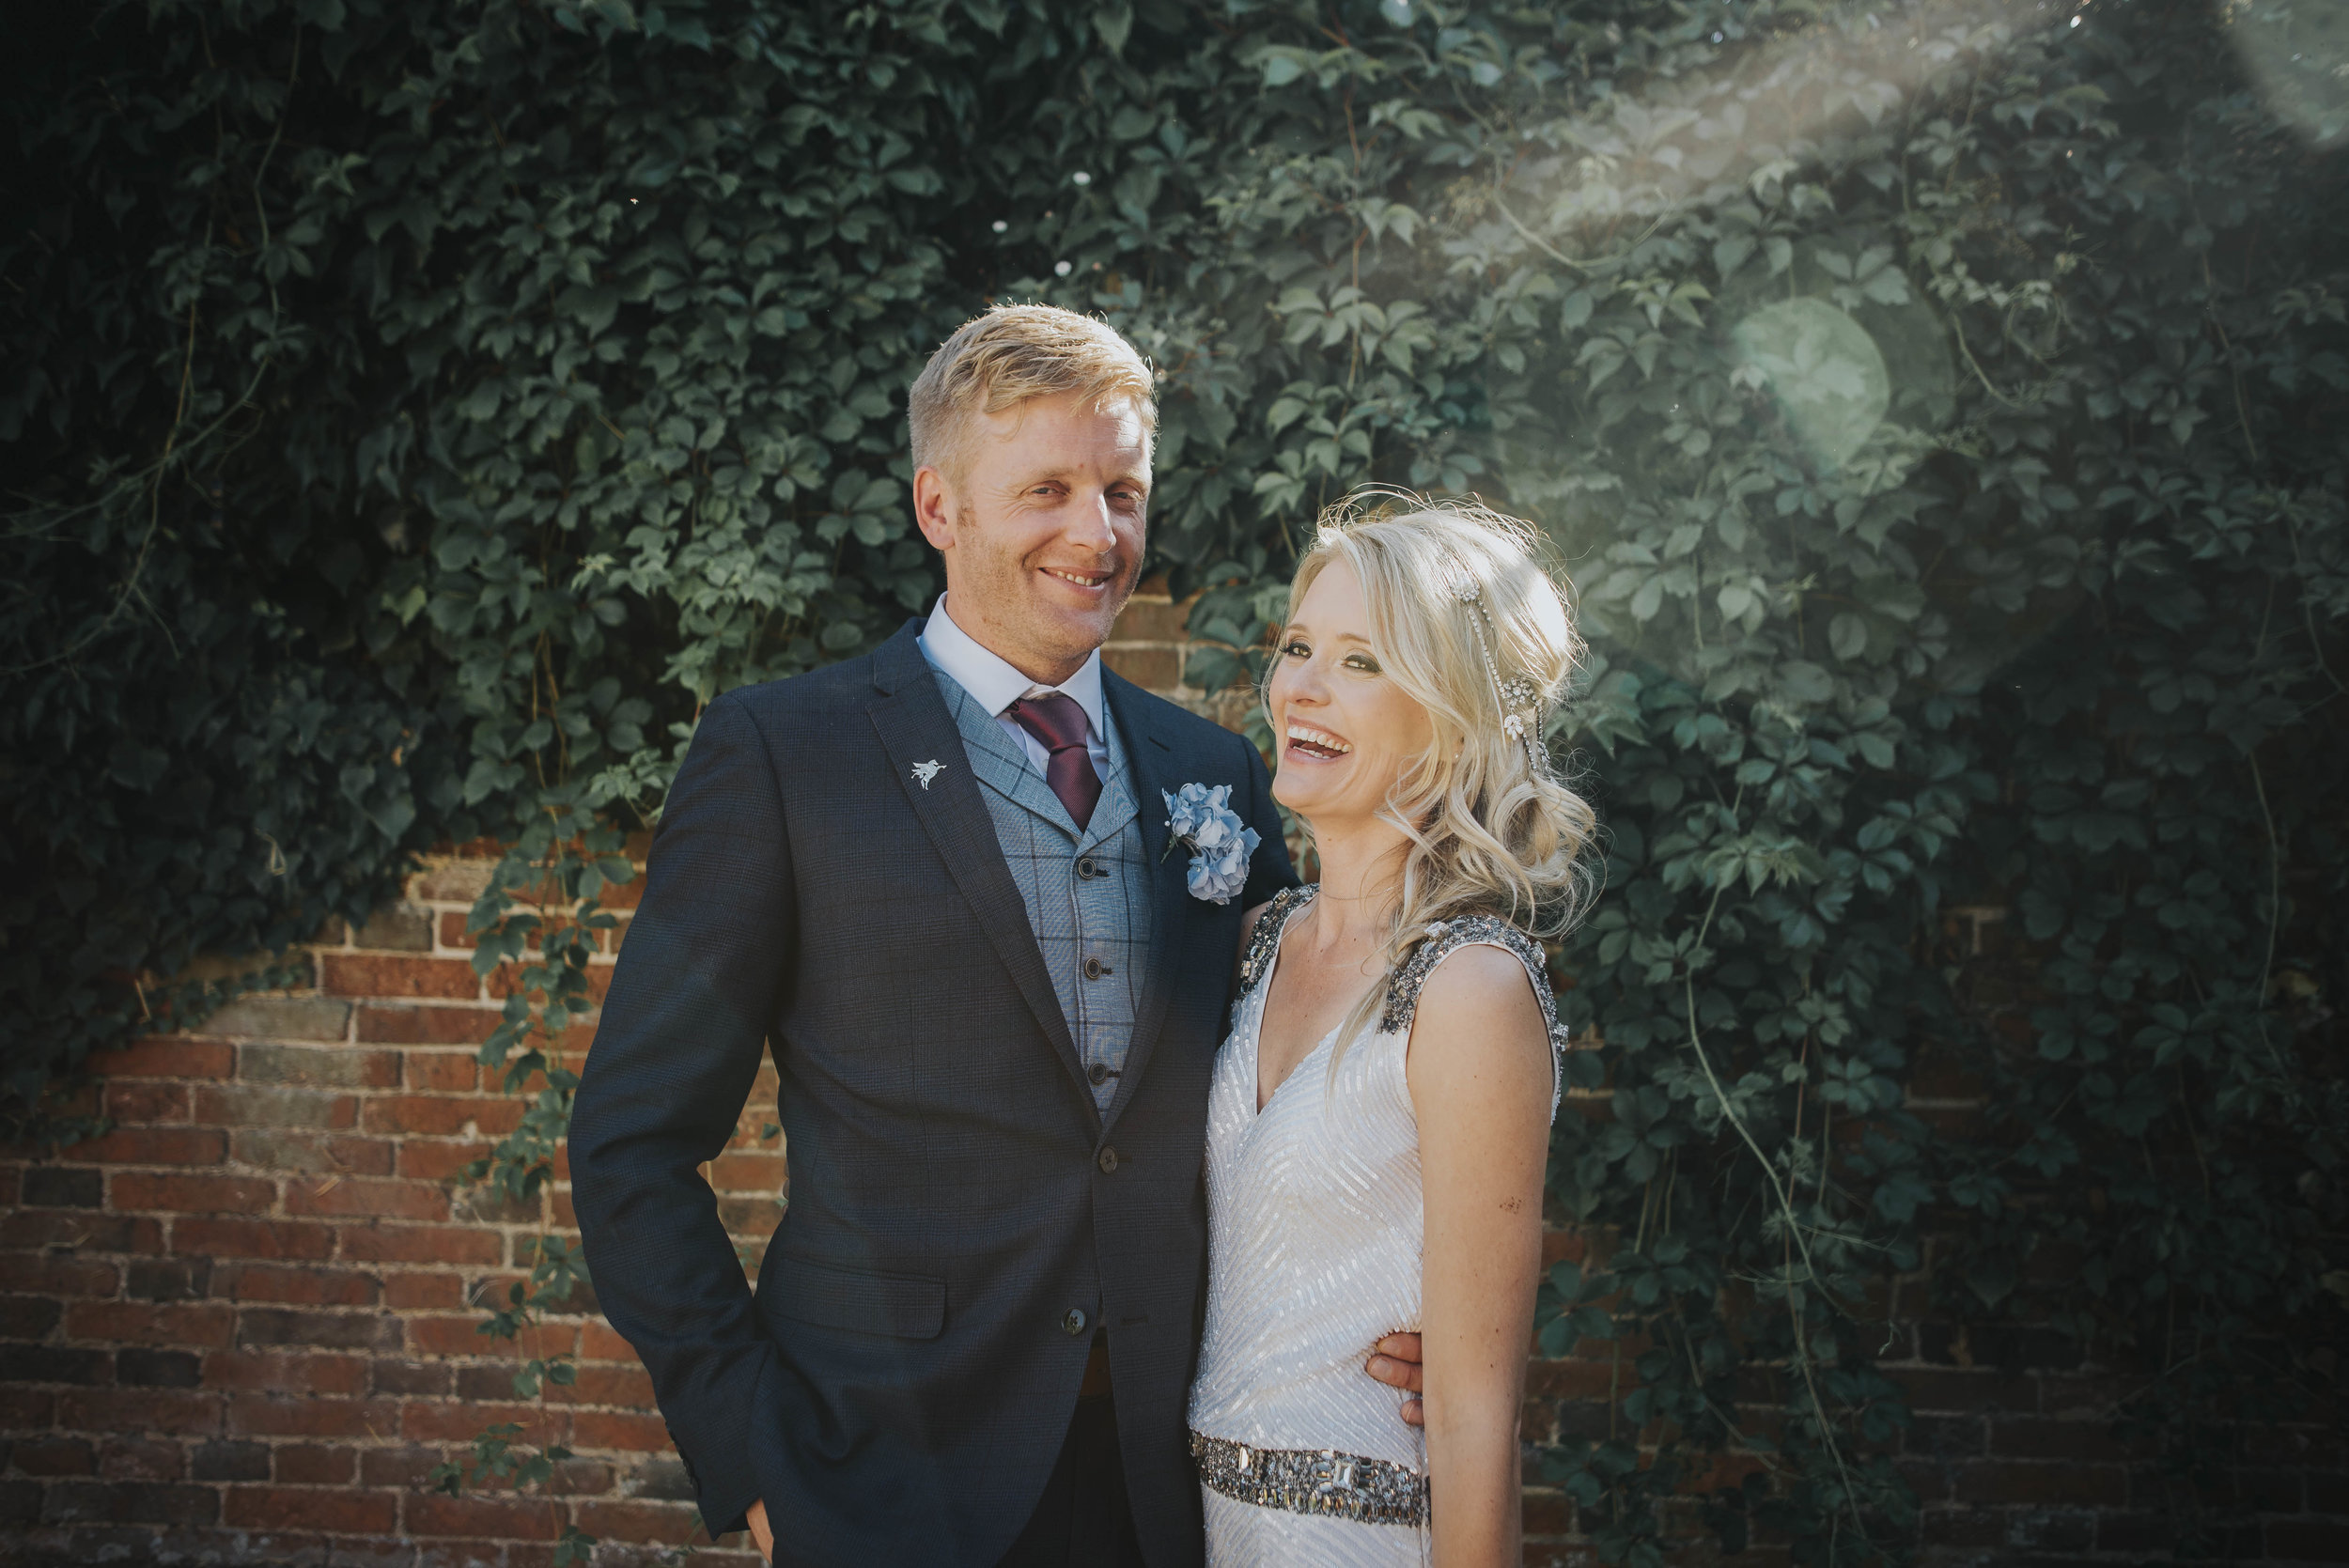 Essex Wedding Photographer + Creative London Wedding Photographer+Suffolk Wedding Photographer